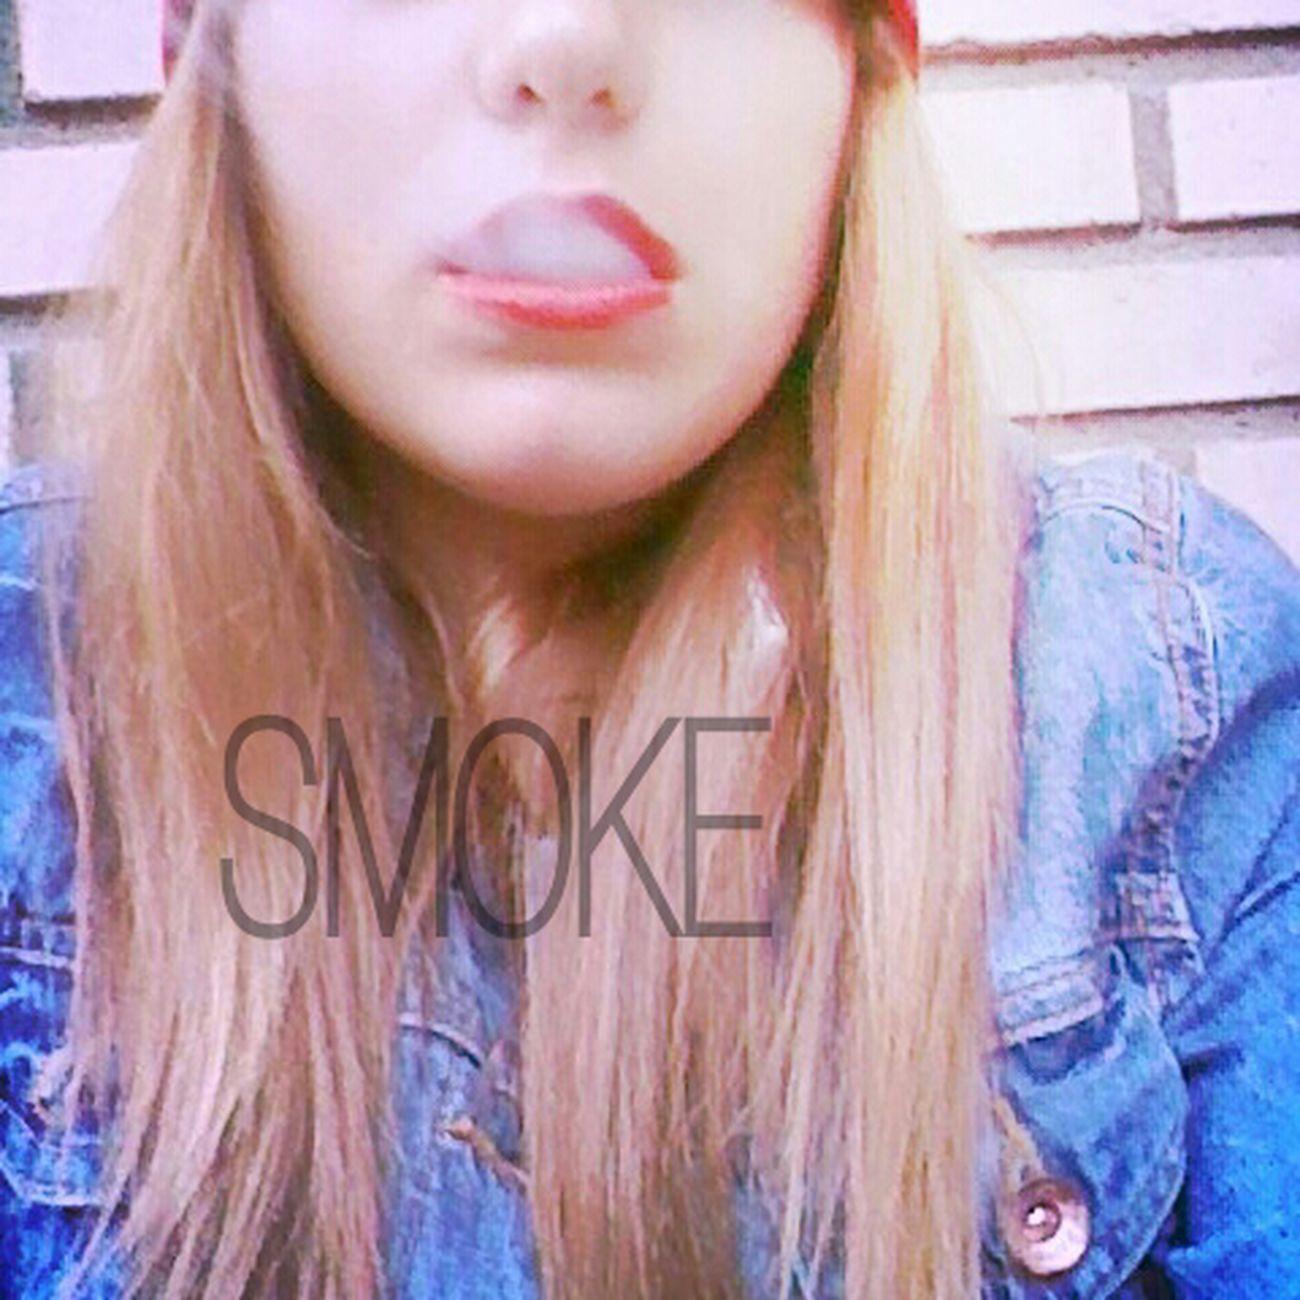 Smoke like a mother fucking chinmey Cigarettes Smoker Relaxing Smoke